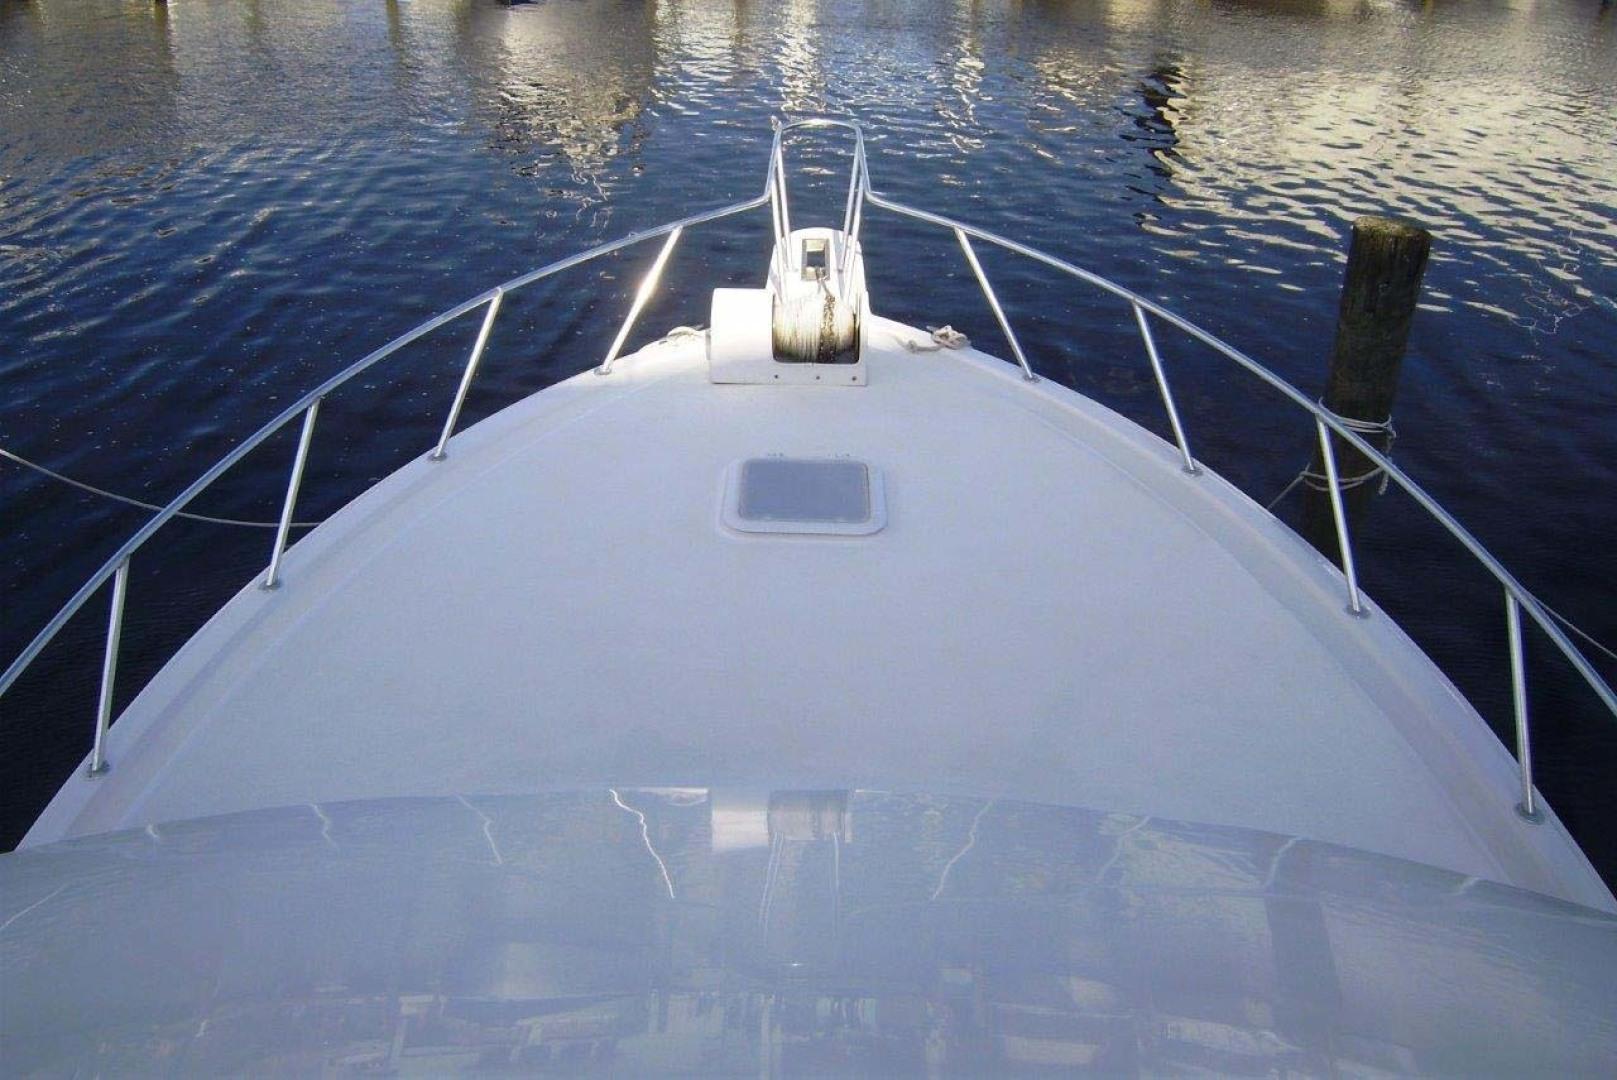 Egg Harbor-43 Sport Yacht 2005-EAGLE Ft. Pierce-Florida-United States-Foredeck-1318485 | Thumbnail